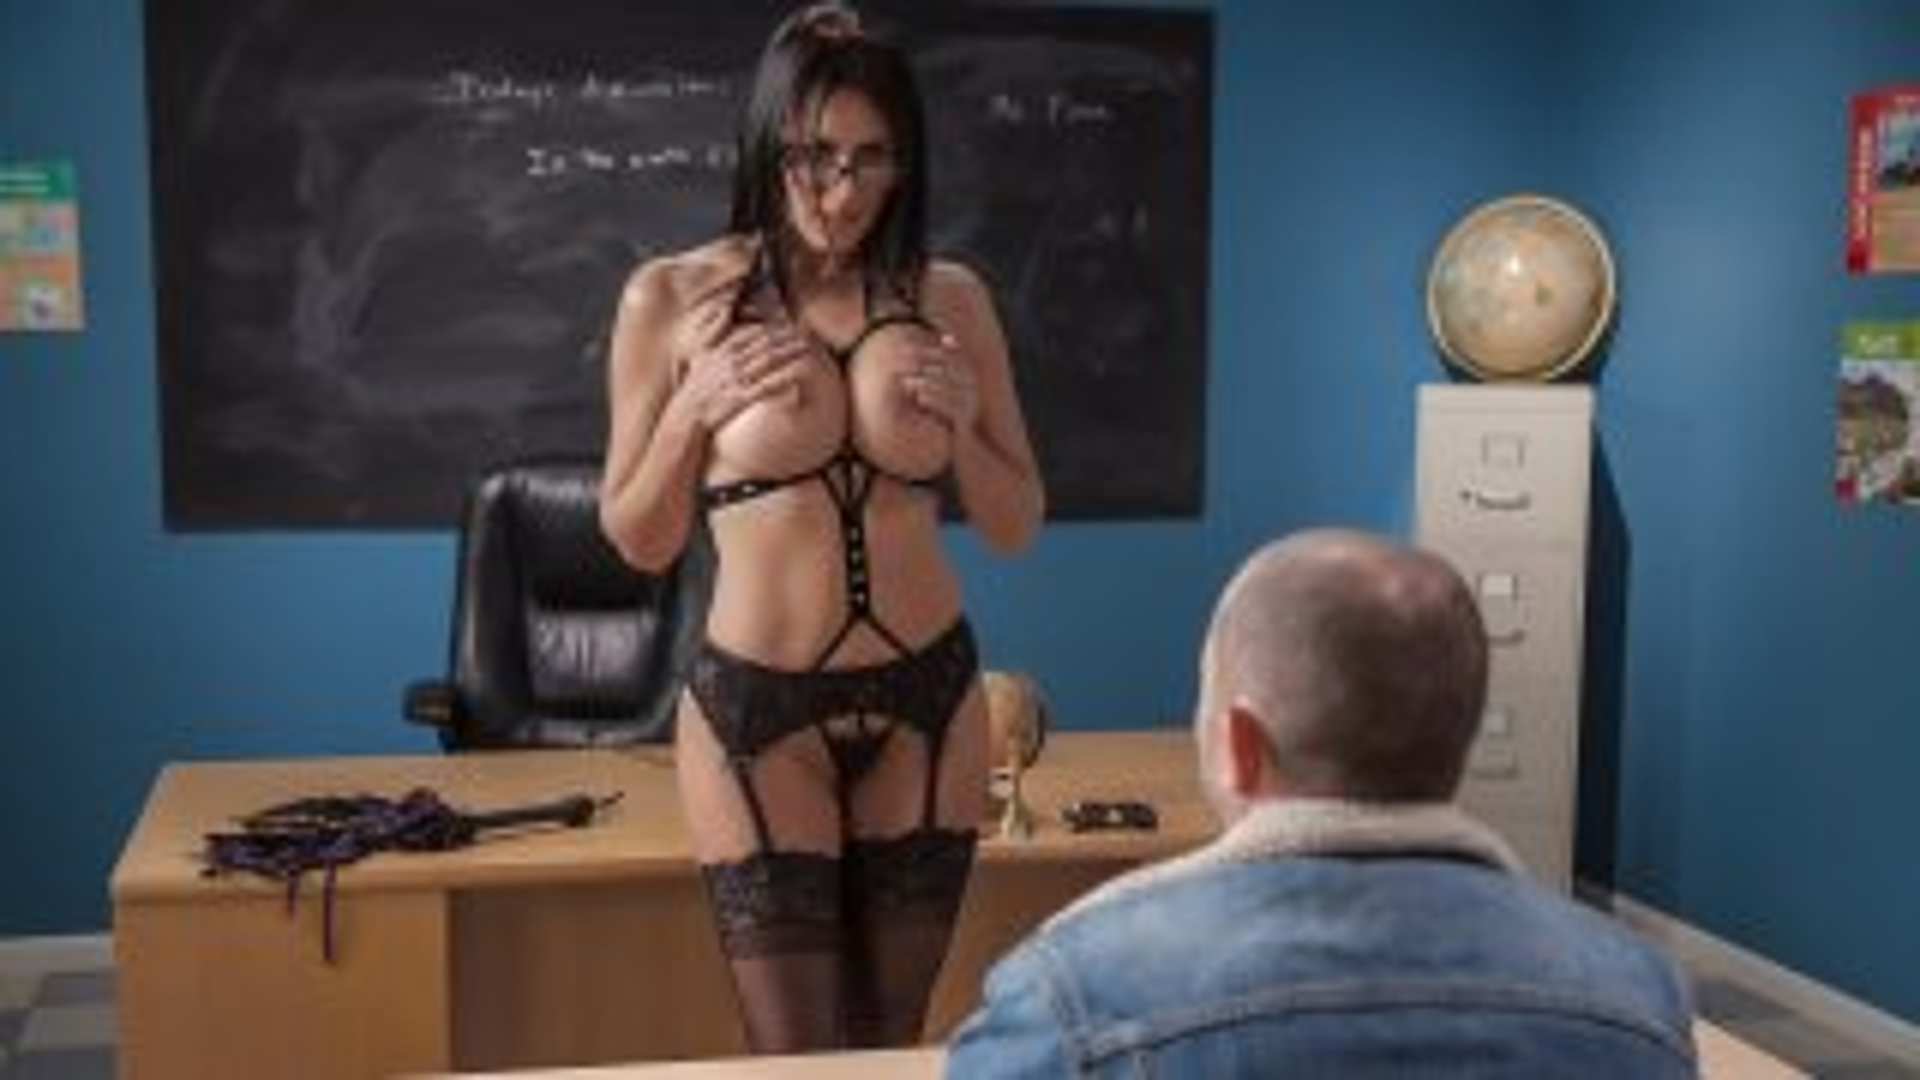 Domme Teacher - Big Tits At School